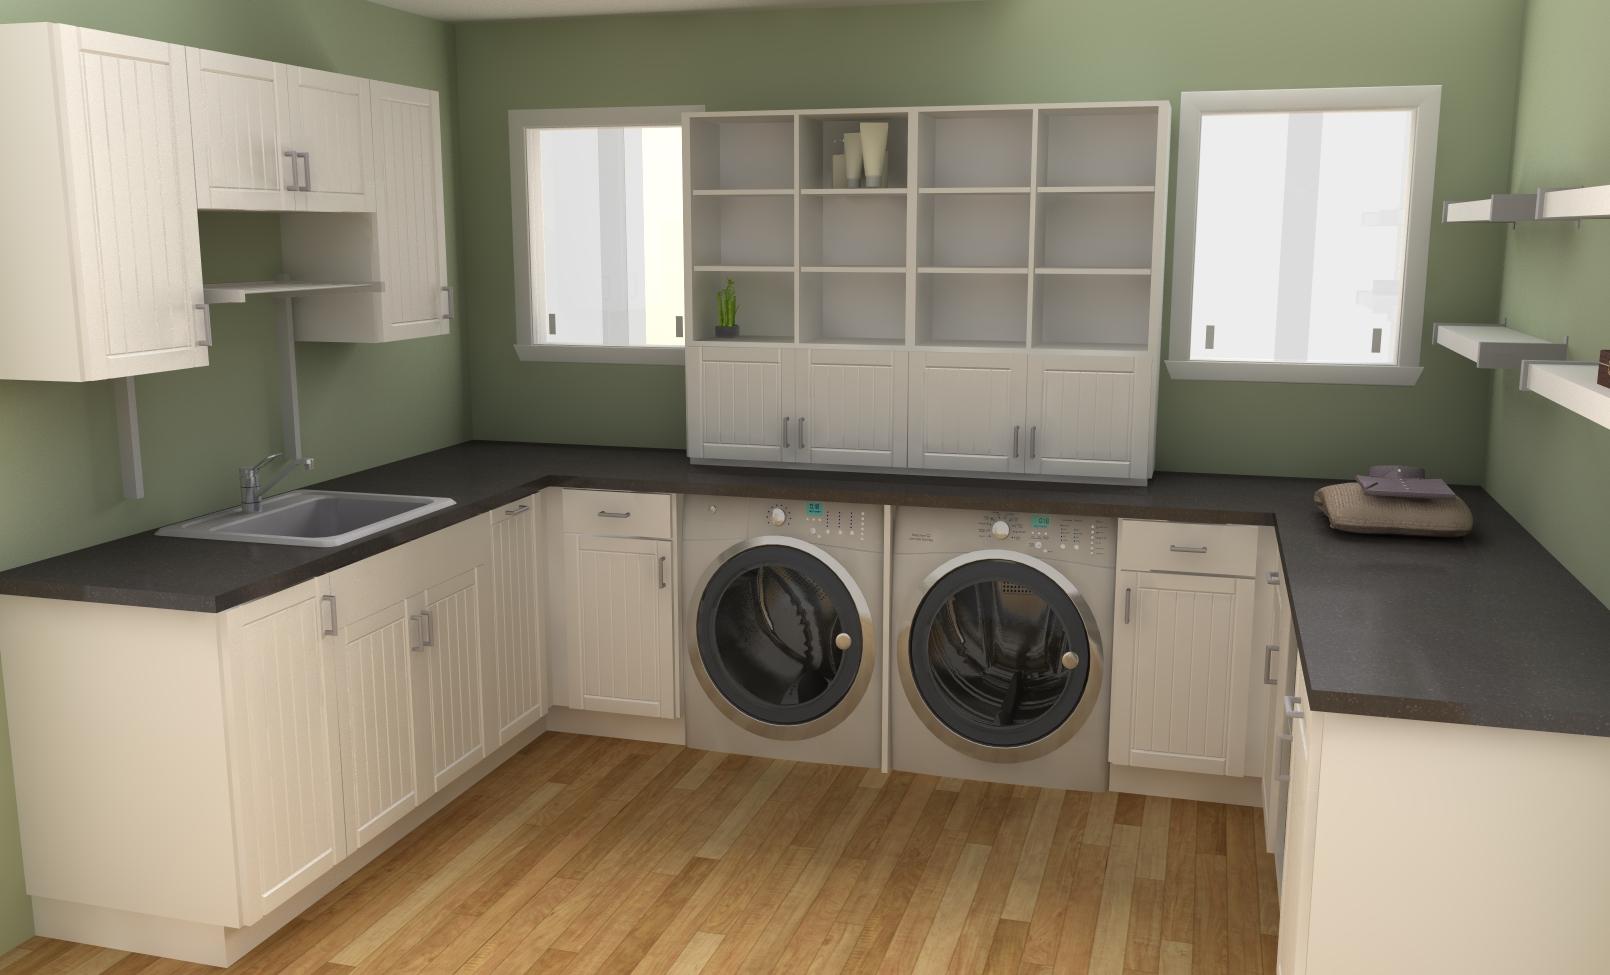 Shelving for Laundry Room Ideas - HomesFeed on Laundry Room Cabinets Ideas  id=55967